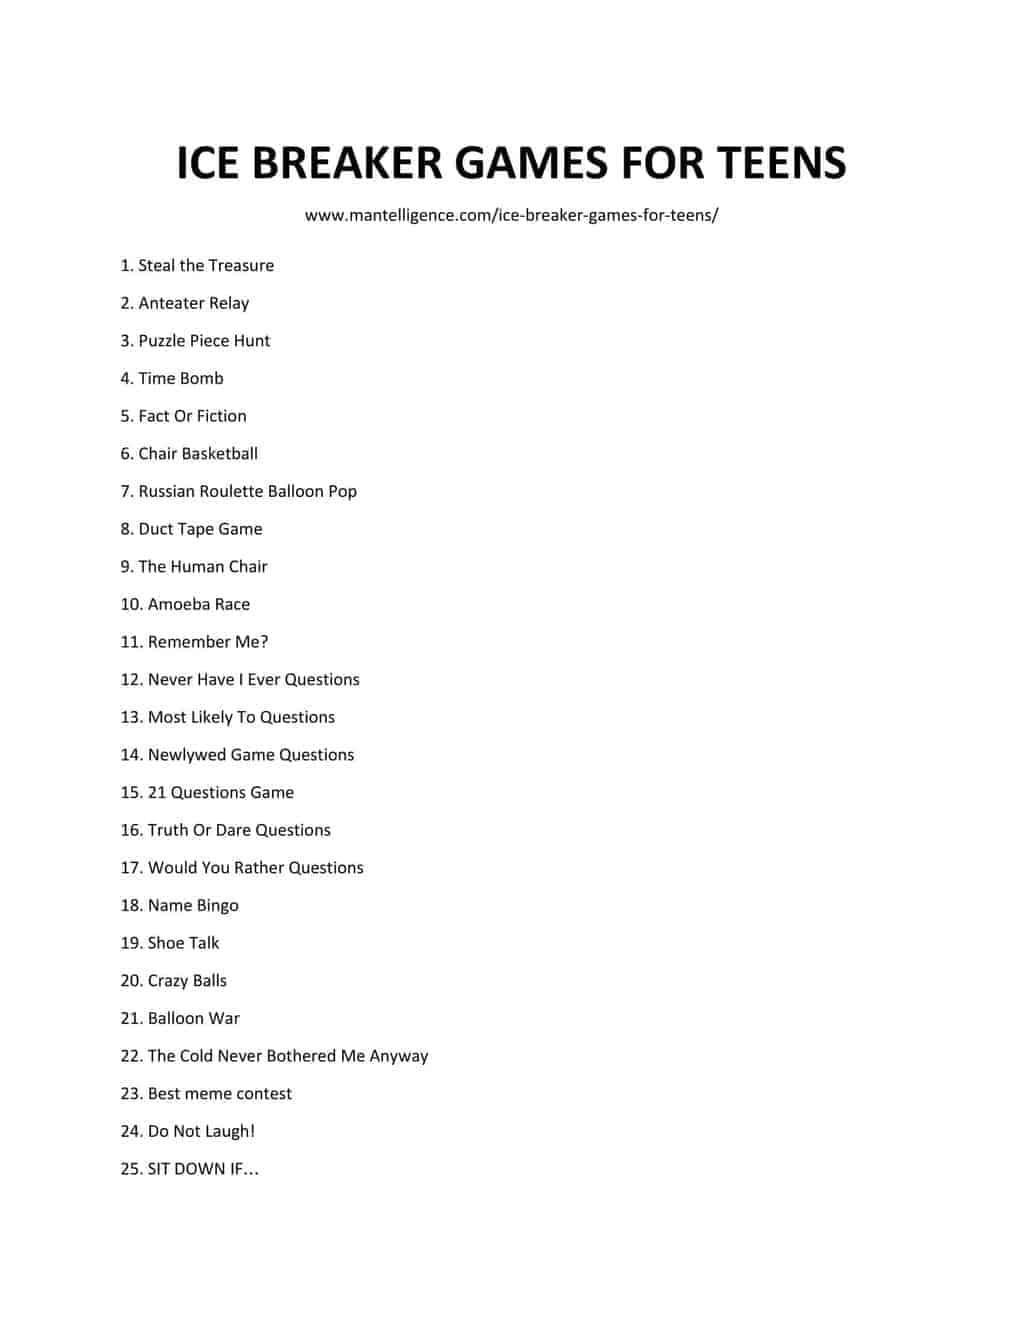 58 Best Ice Breaker Games For Teens